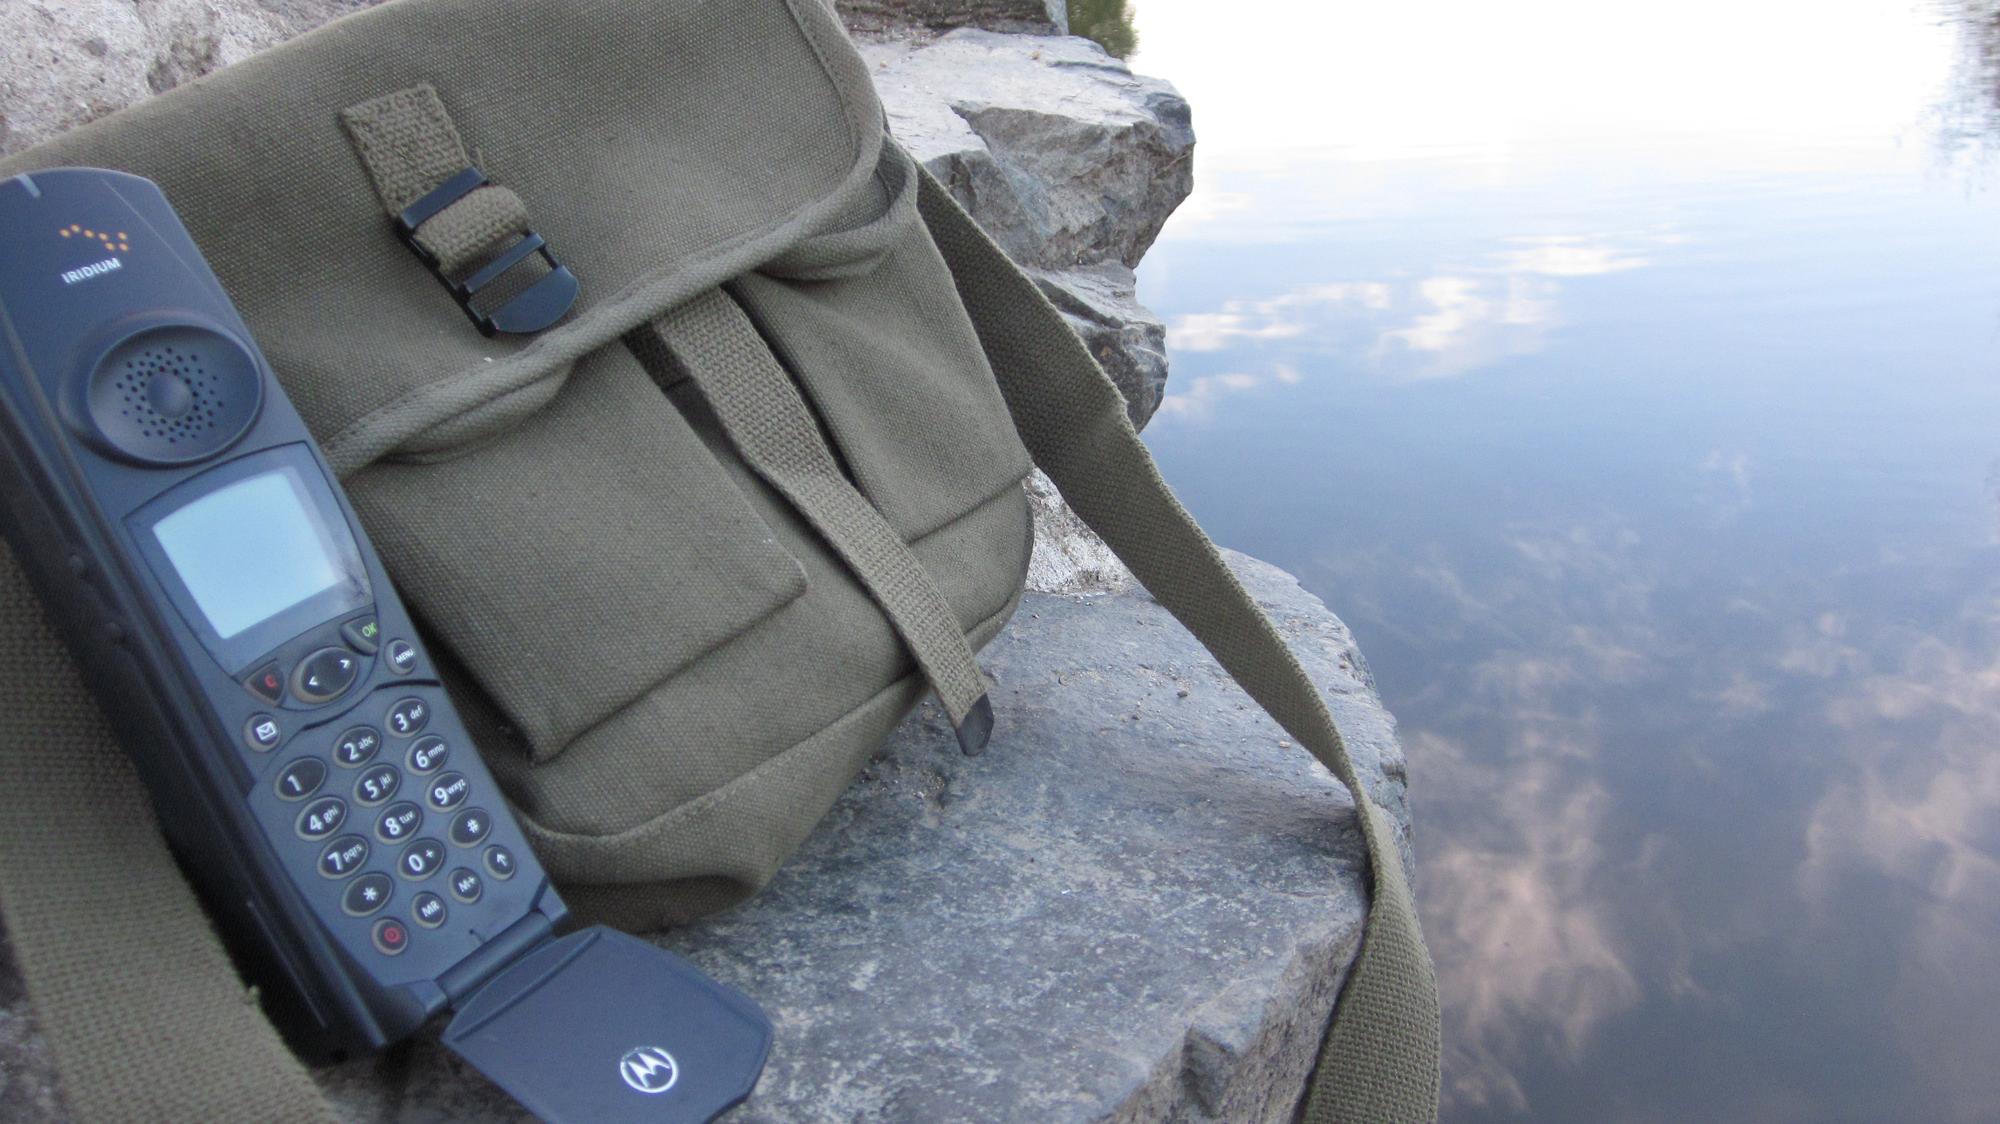 iridium-motorola-9500-satellite-phone-with-carrying-case.png